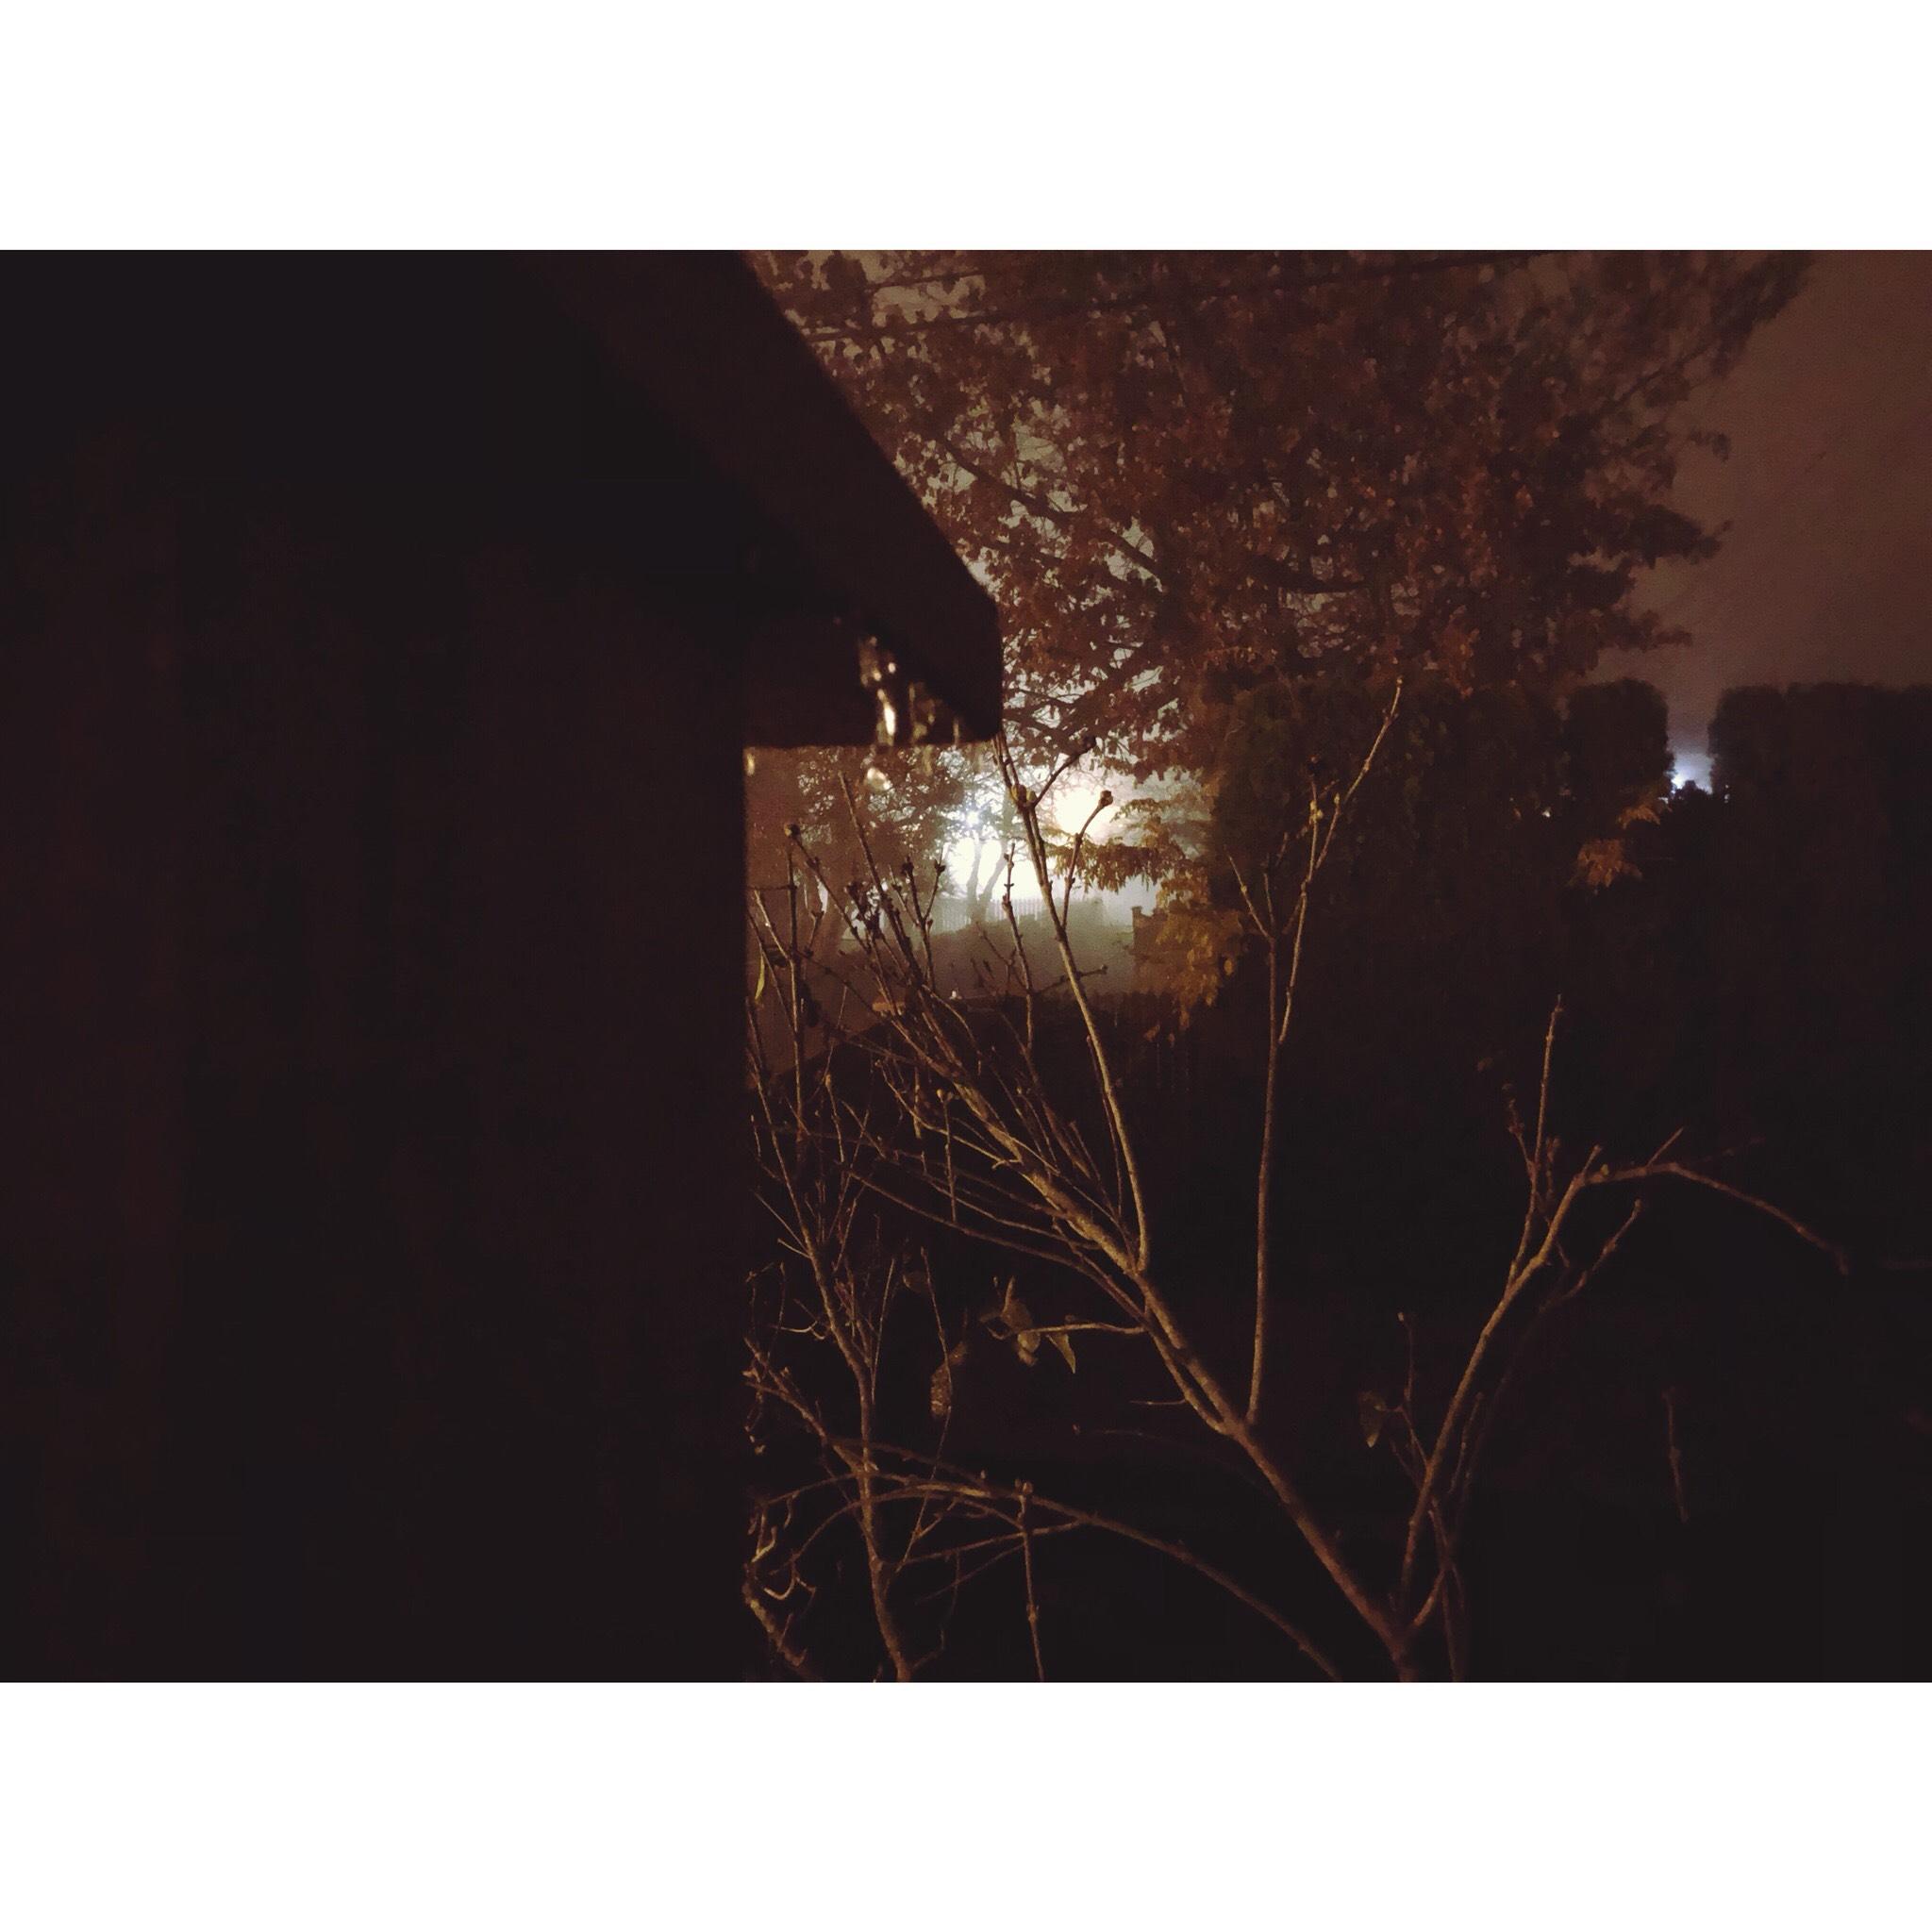 AfterlightImage(19).jpeg